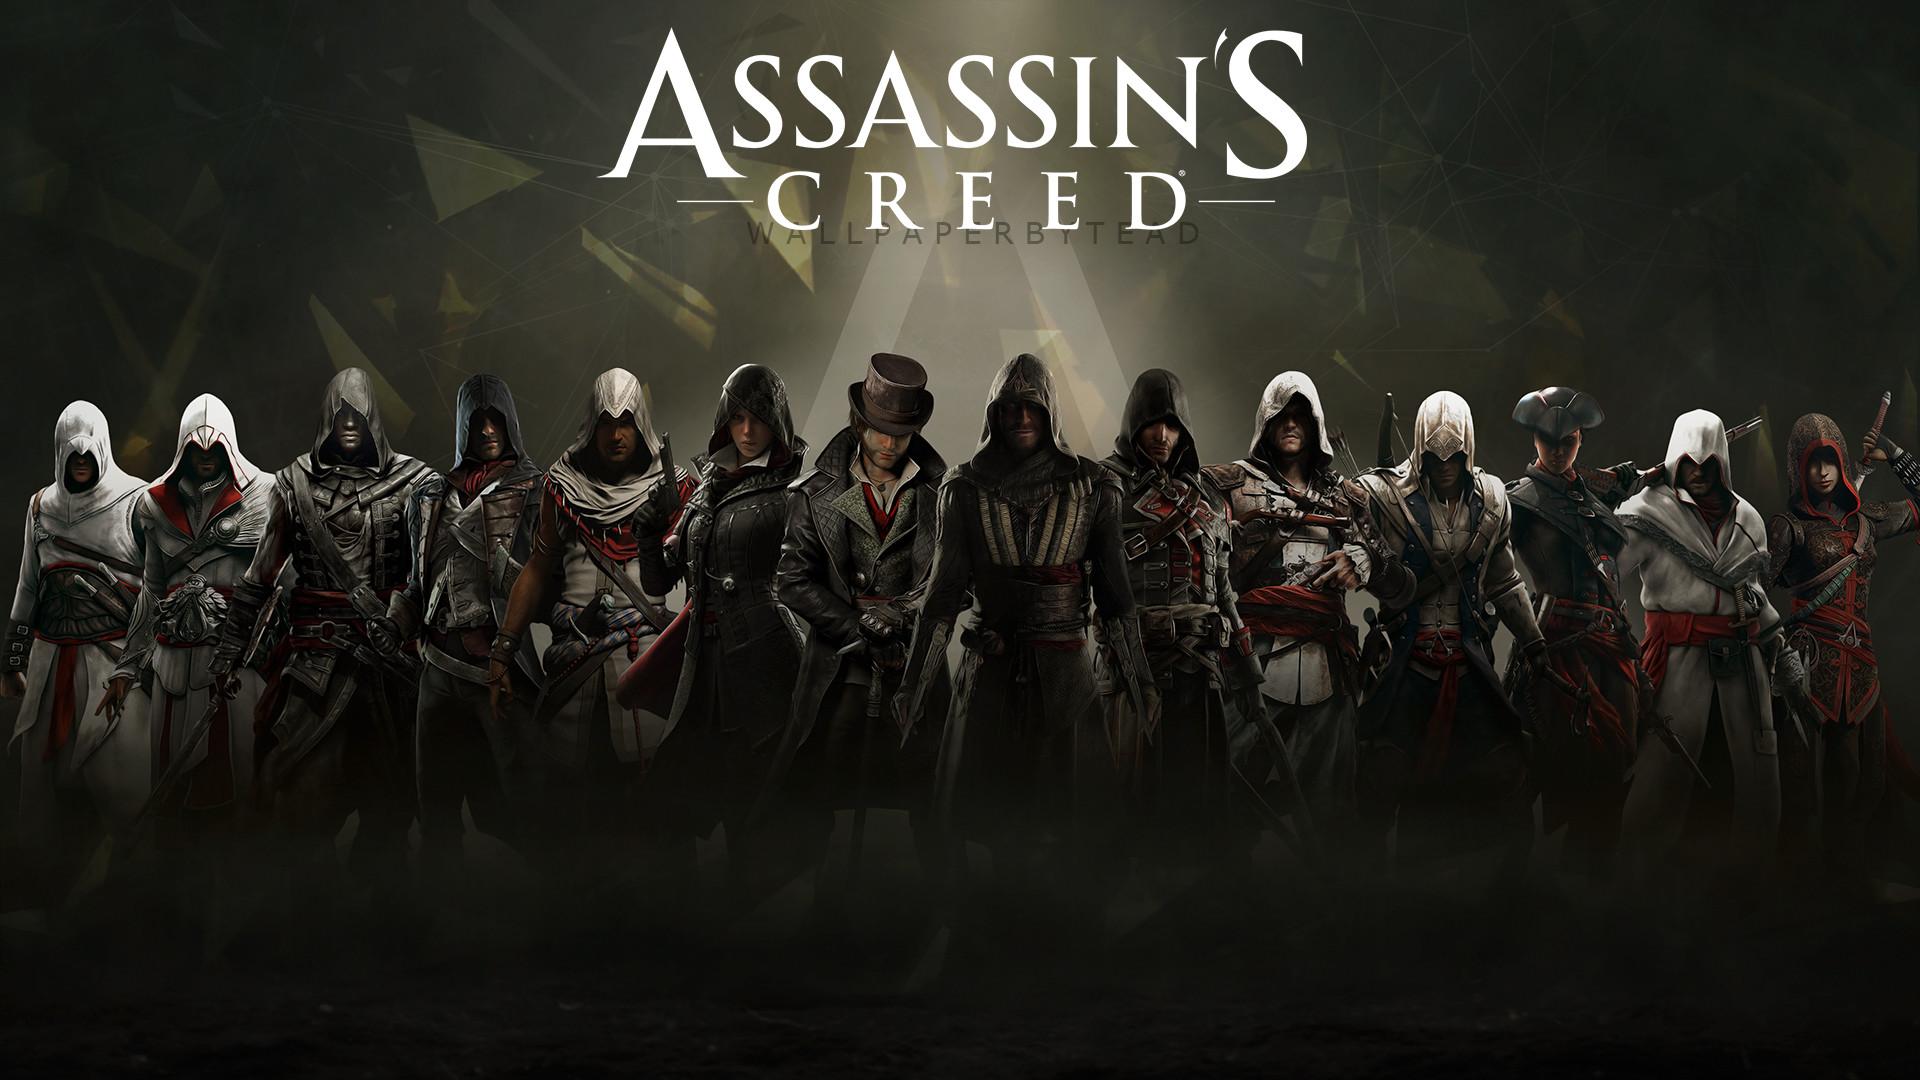 Assassins Creed Wallpaper HD (81+ Images